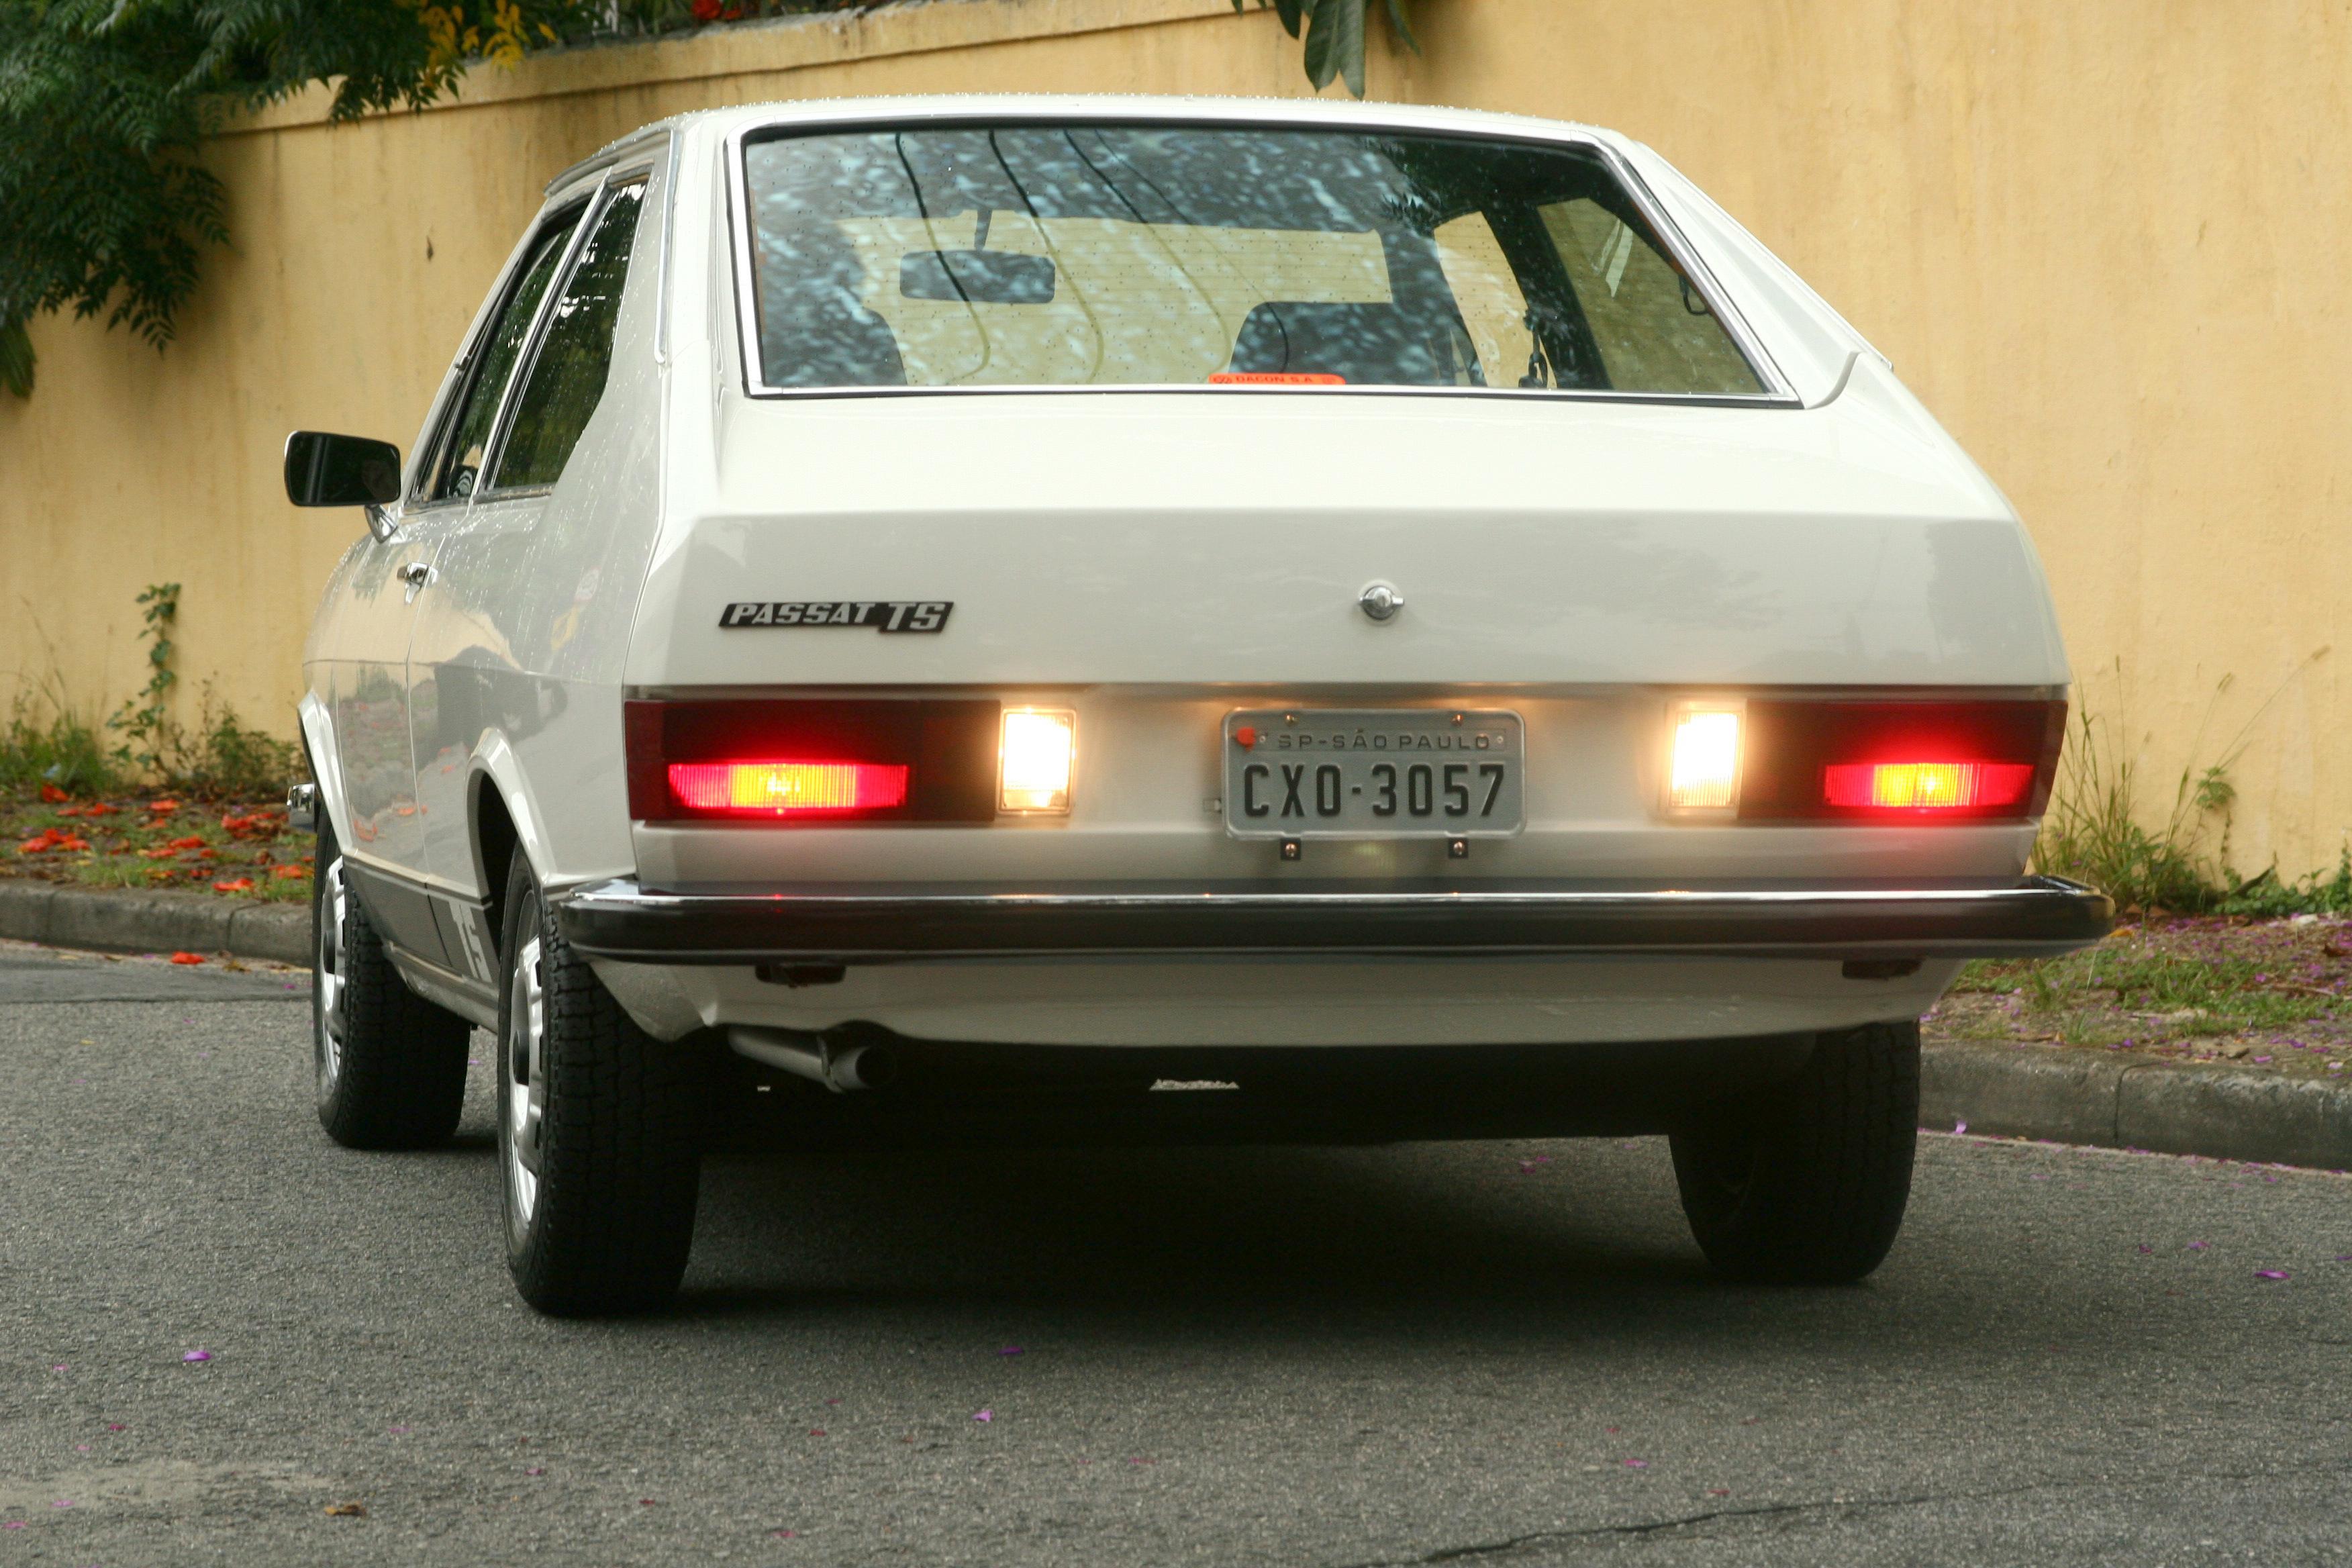 Passat TS 78 da Volkswagen testado pela revista Quatro Rodas.